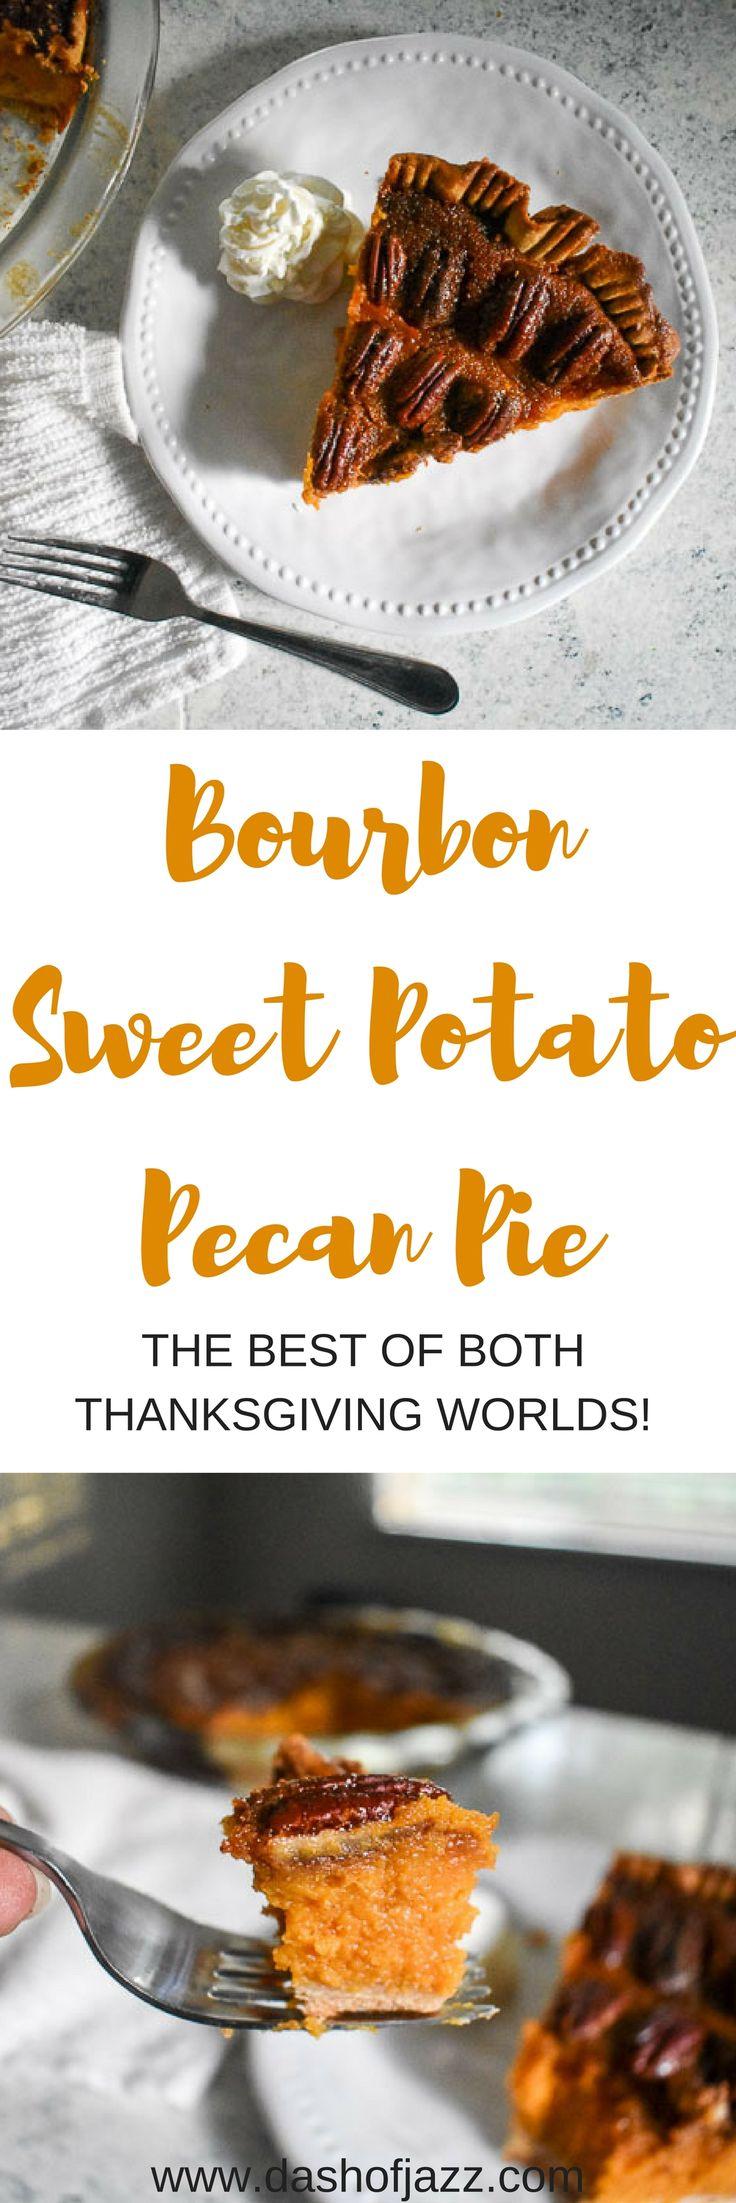 Bourbon Sweet Potato Pecan Pie is the best of both Thanksgiving dessert worlds! Recipe by Dash of Jazz